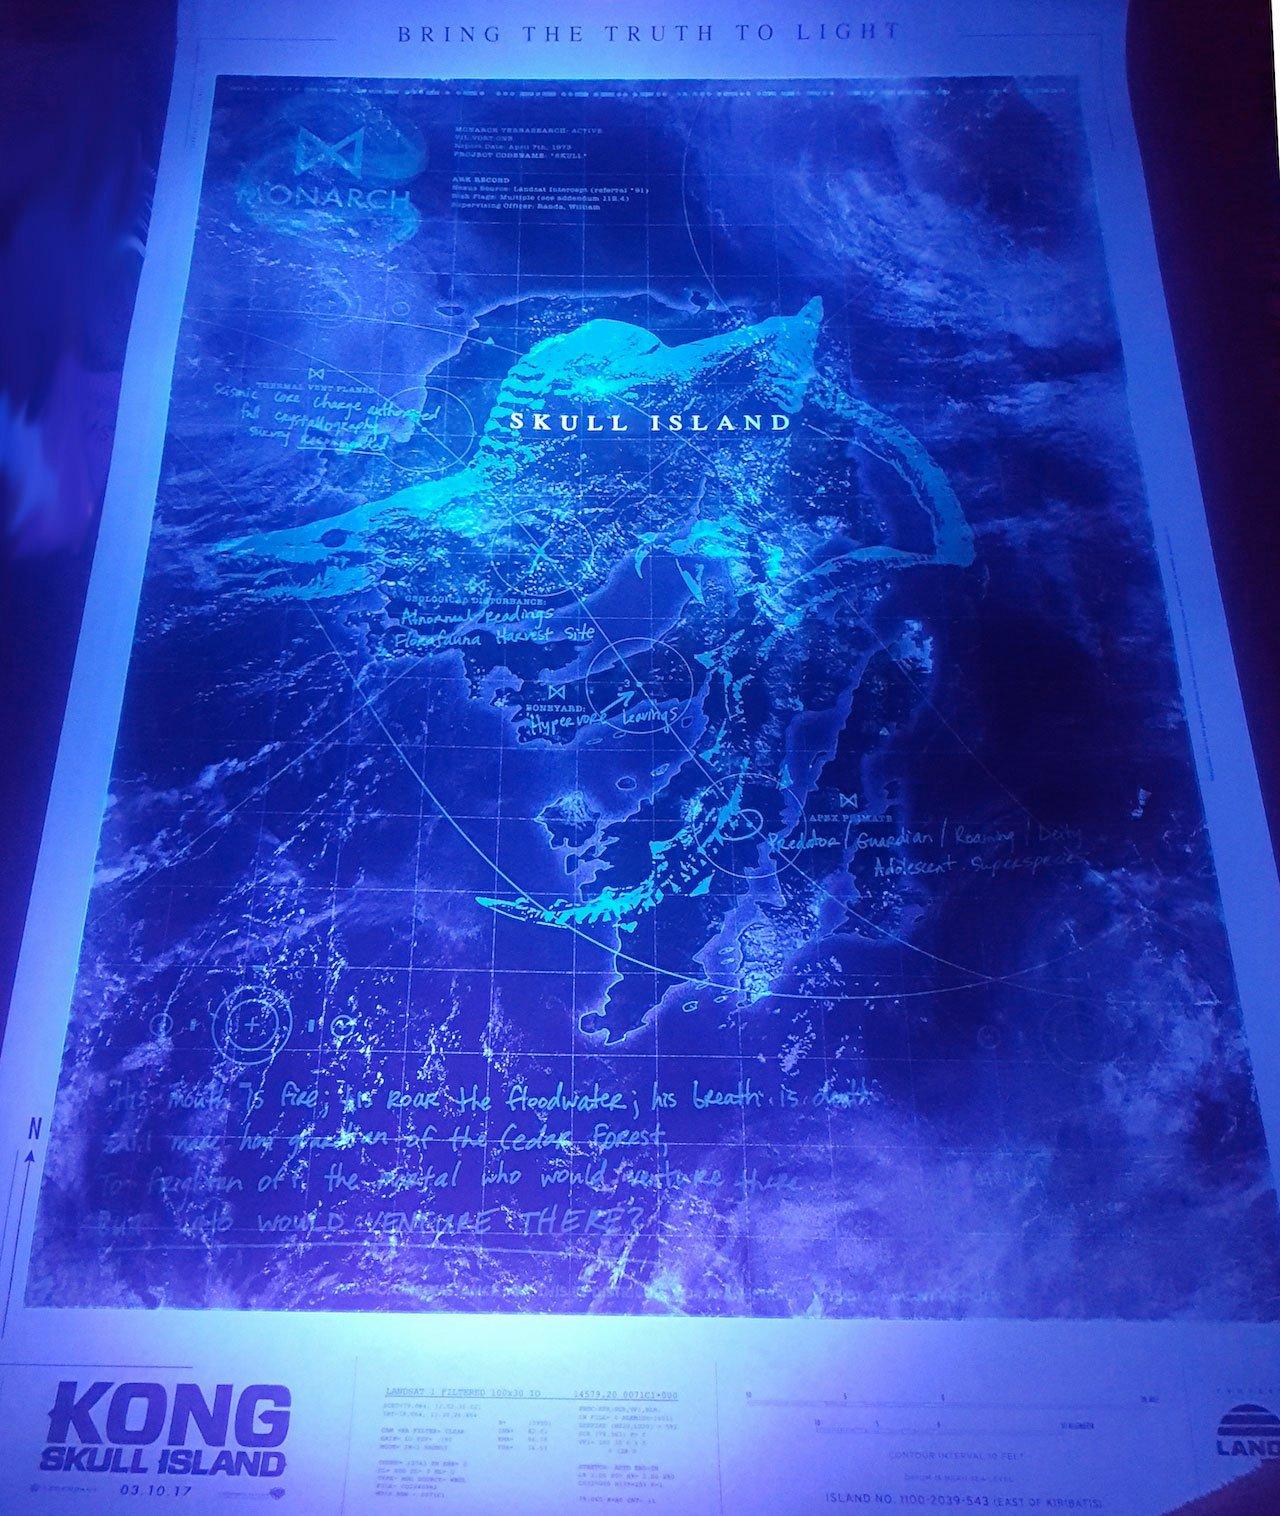 kong-skull-island-poster-viral-black-light